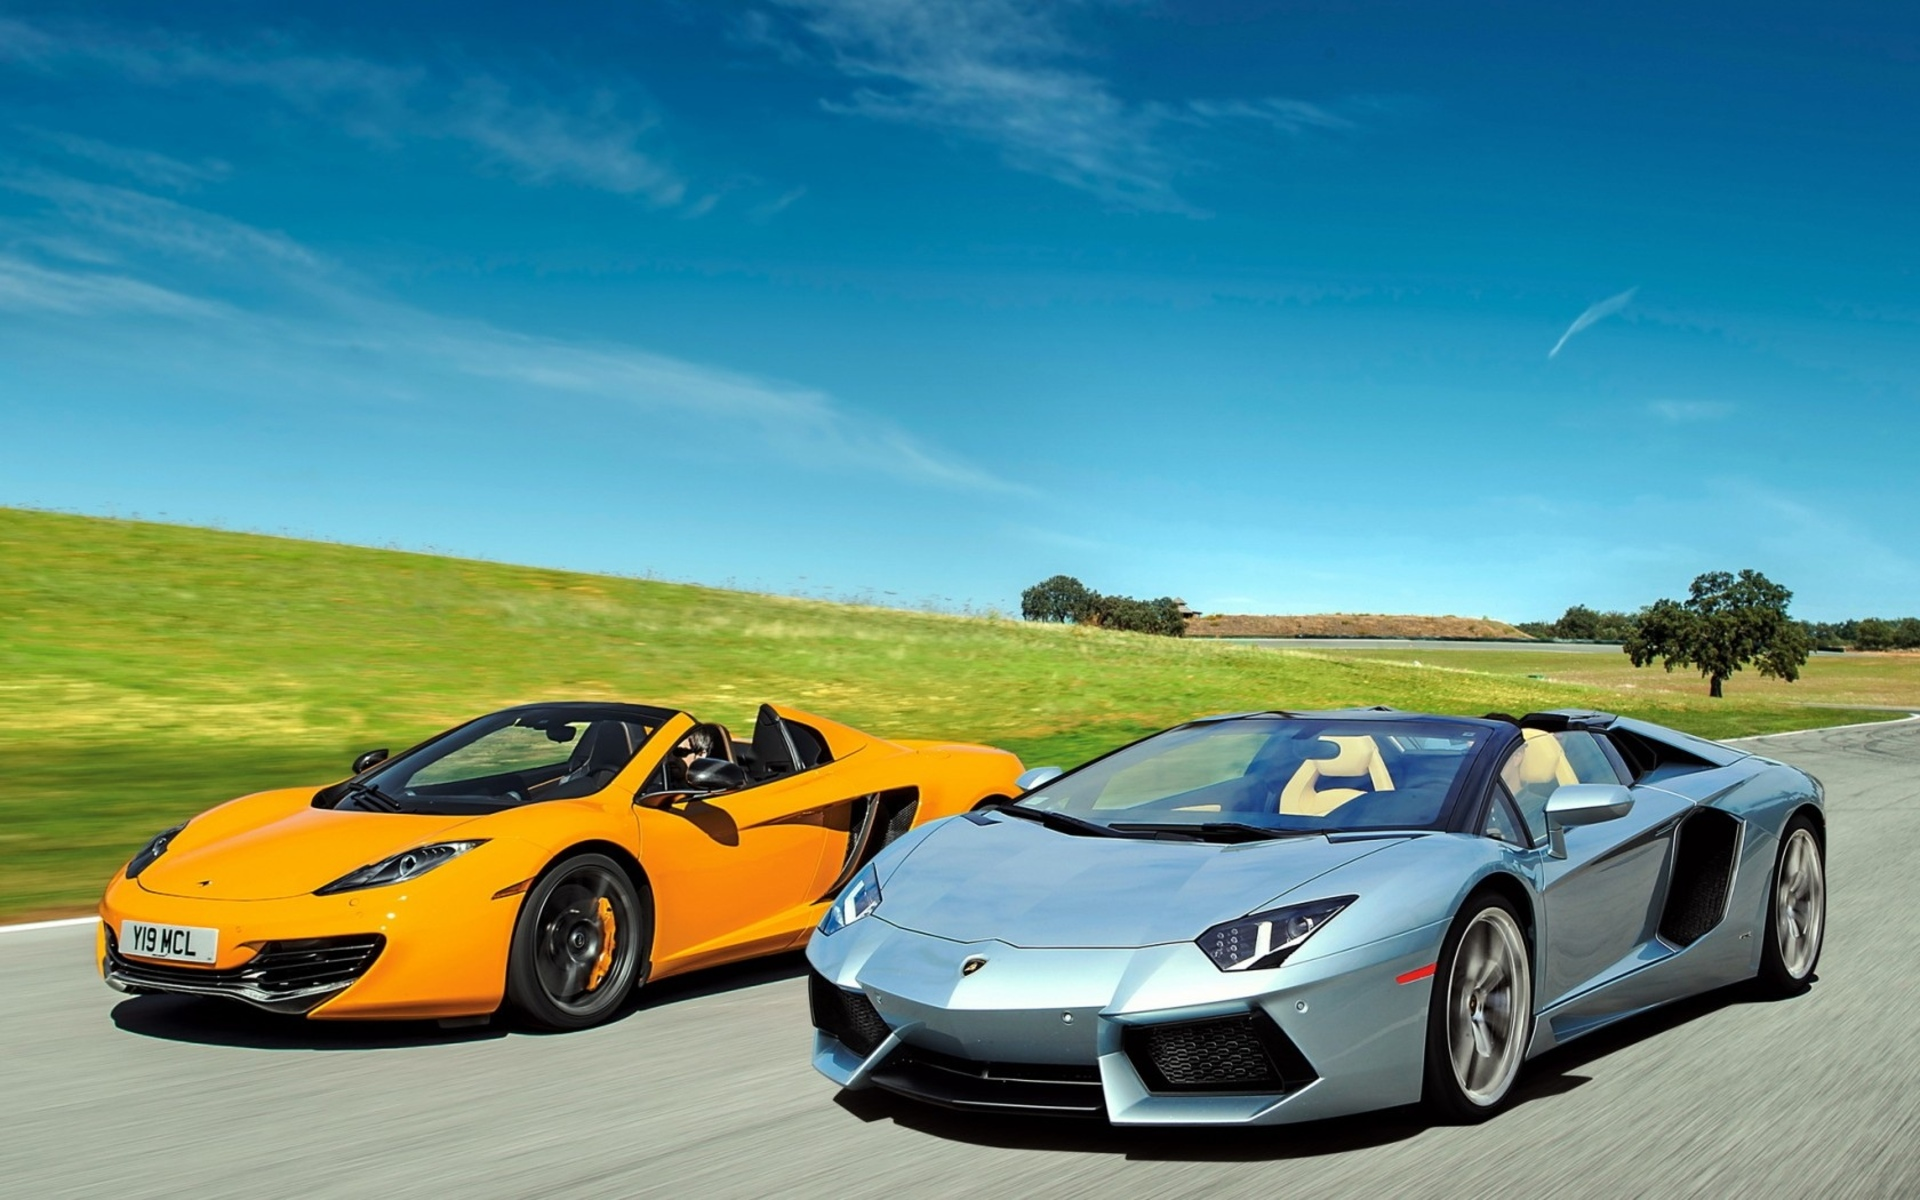 Lamborghini HD Wallpaper | Background Image | 1920x1200 ...